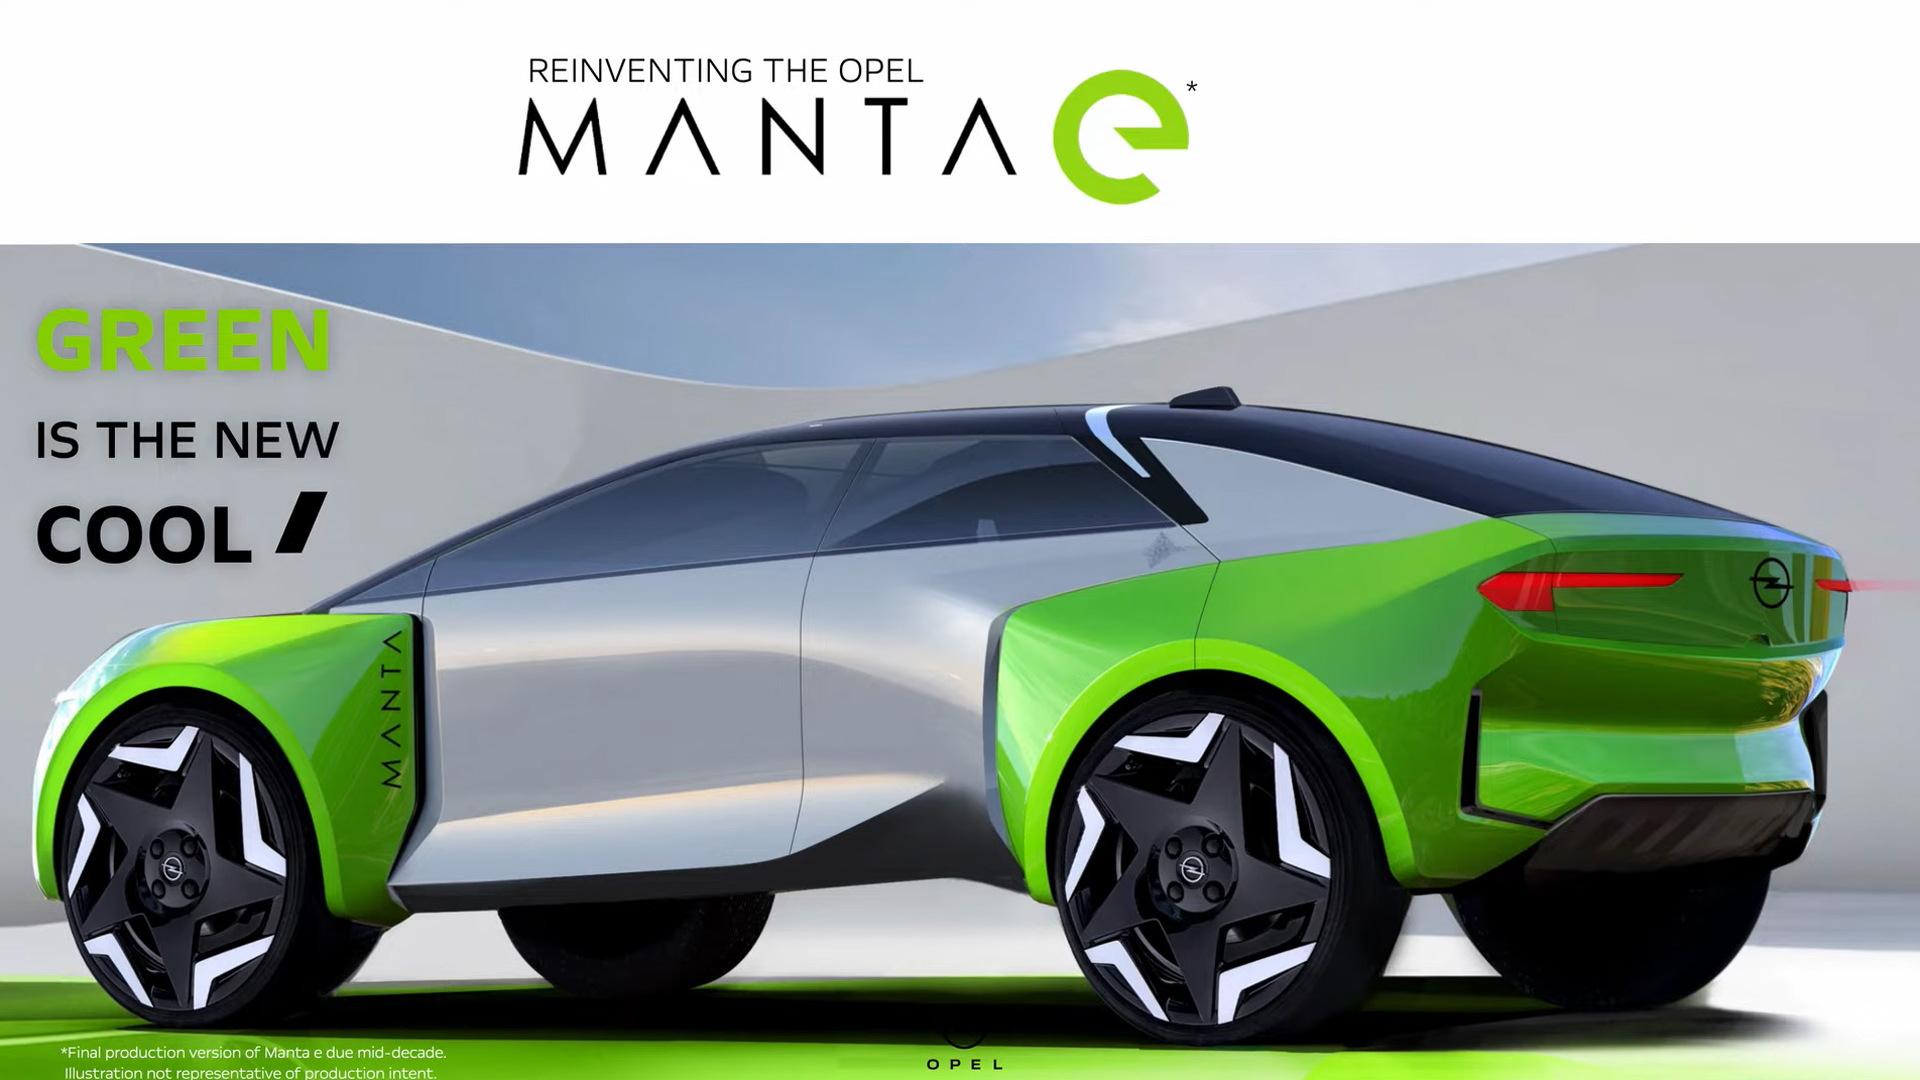 Teaser for Opel Manta E debuting around mid-2020